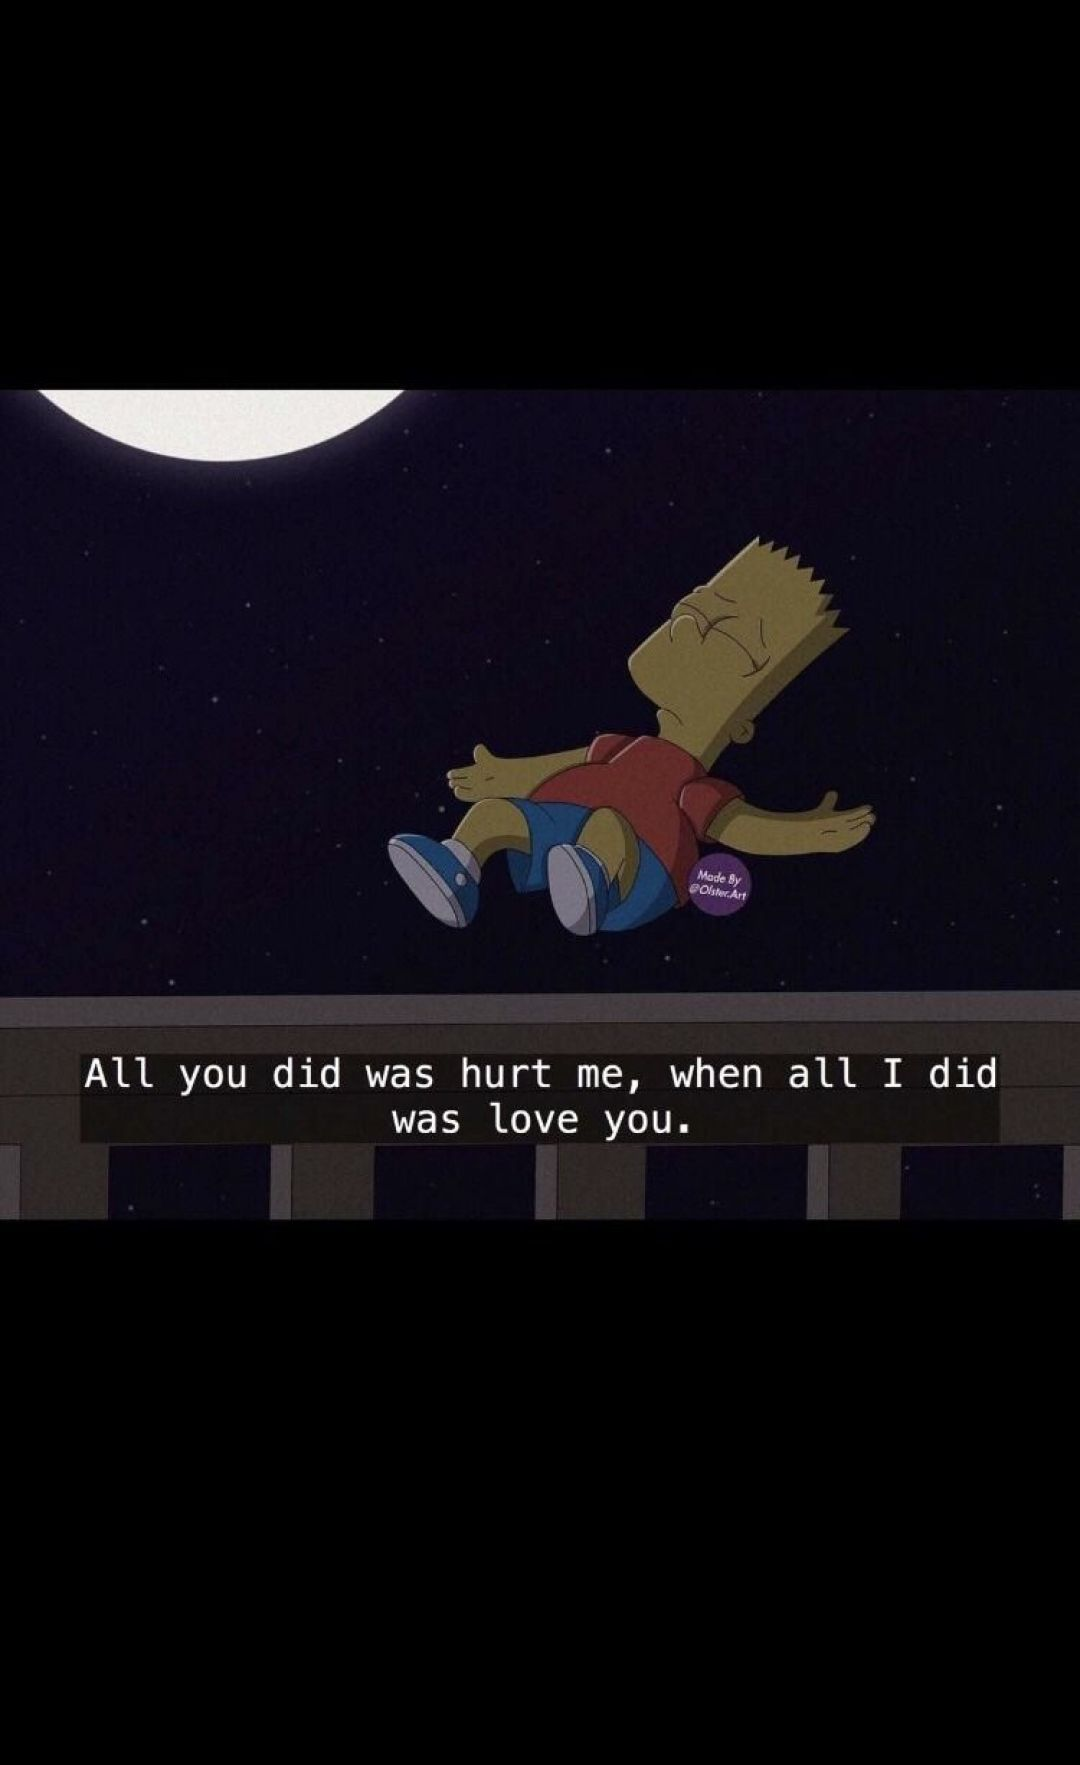 Sad Aesthetic Quote Sad Quote Bart Simpson 1080x1765 Wallpaper Teahub Io